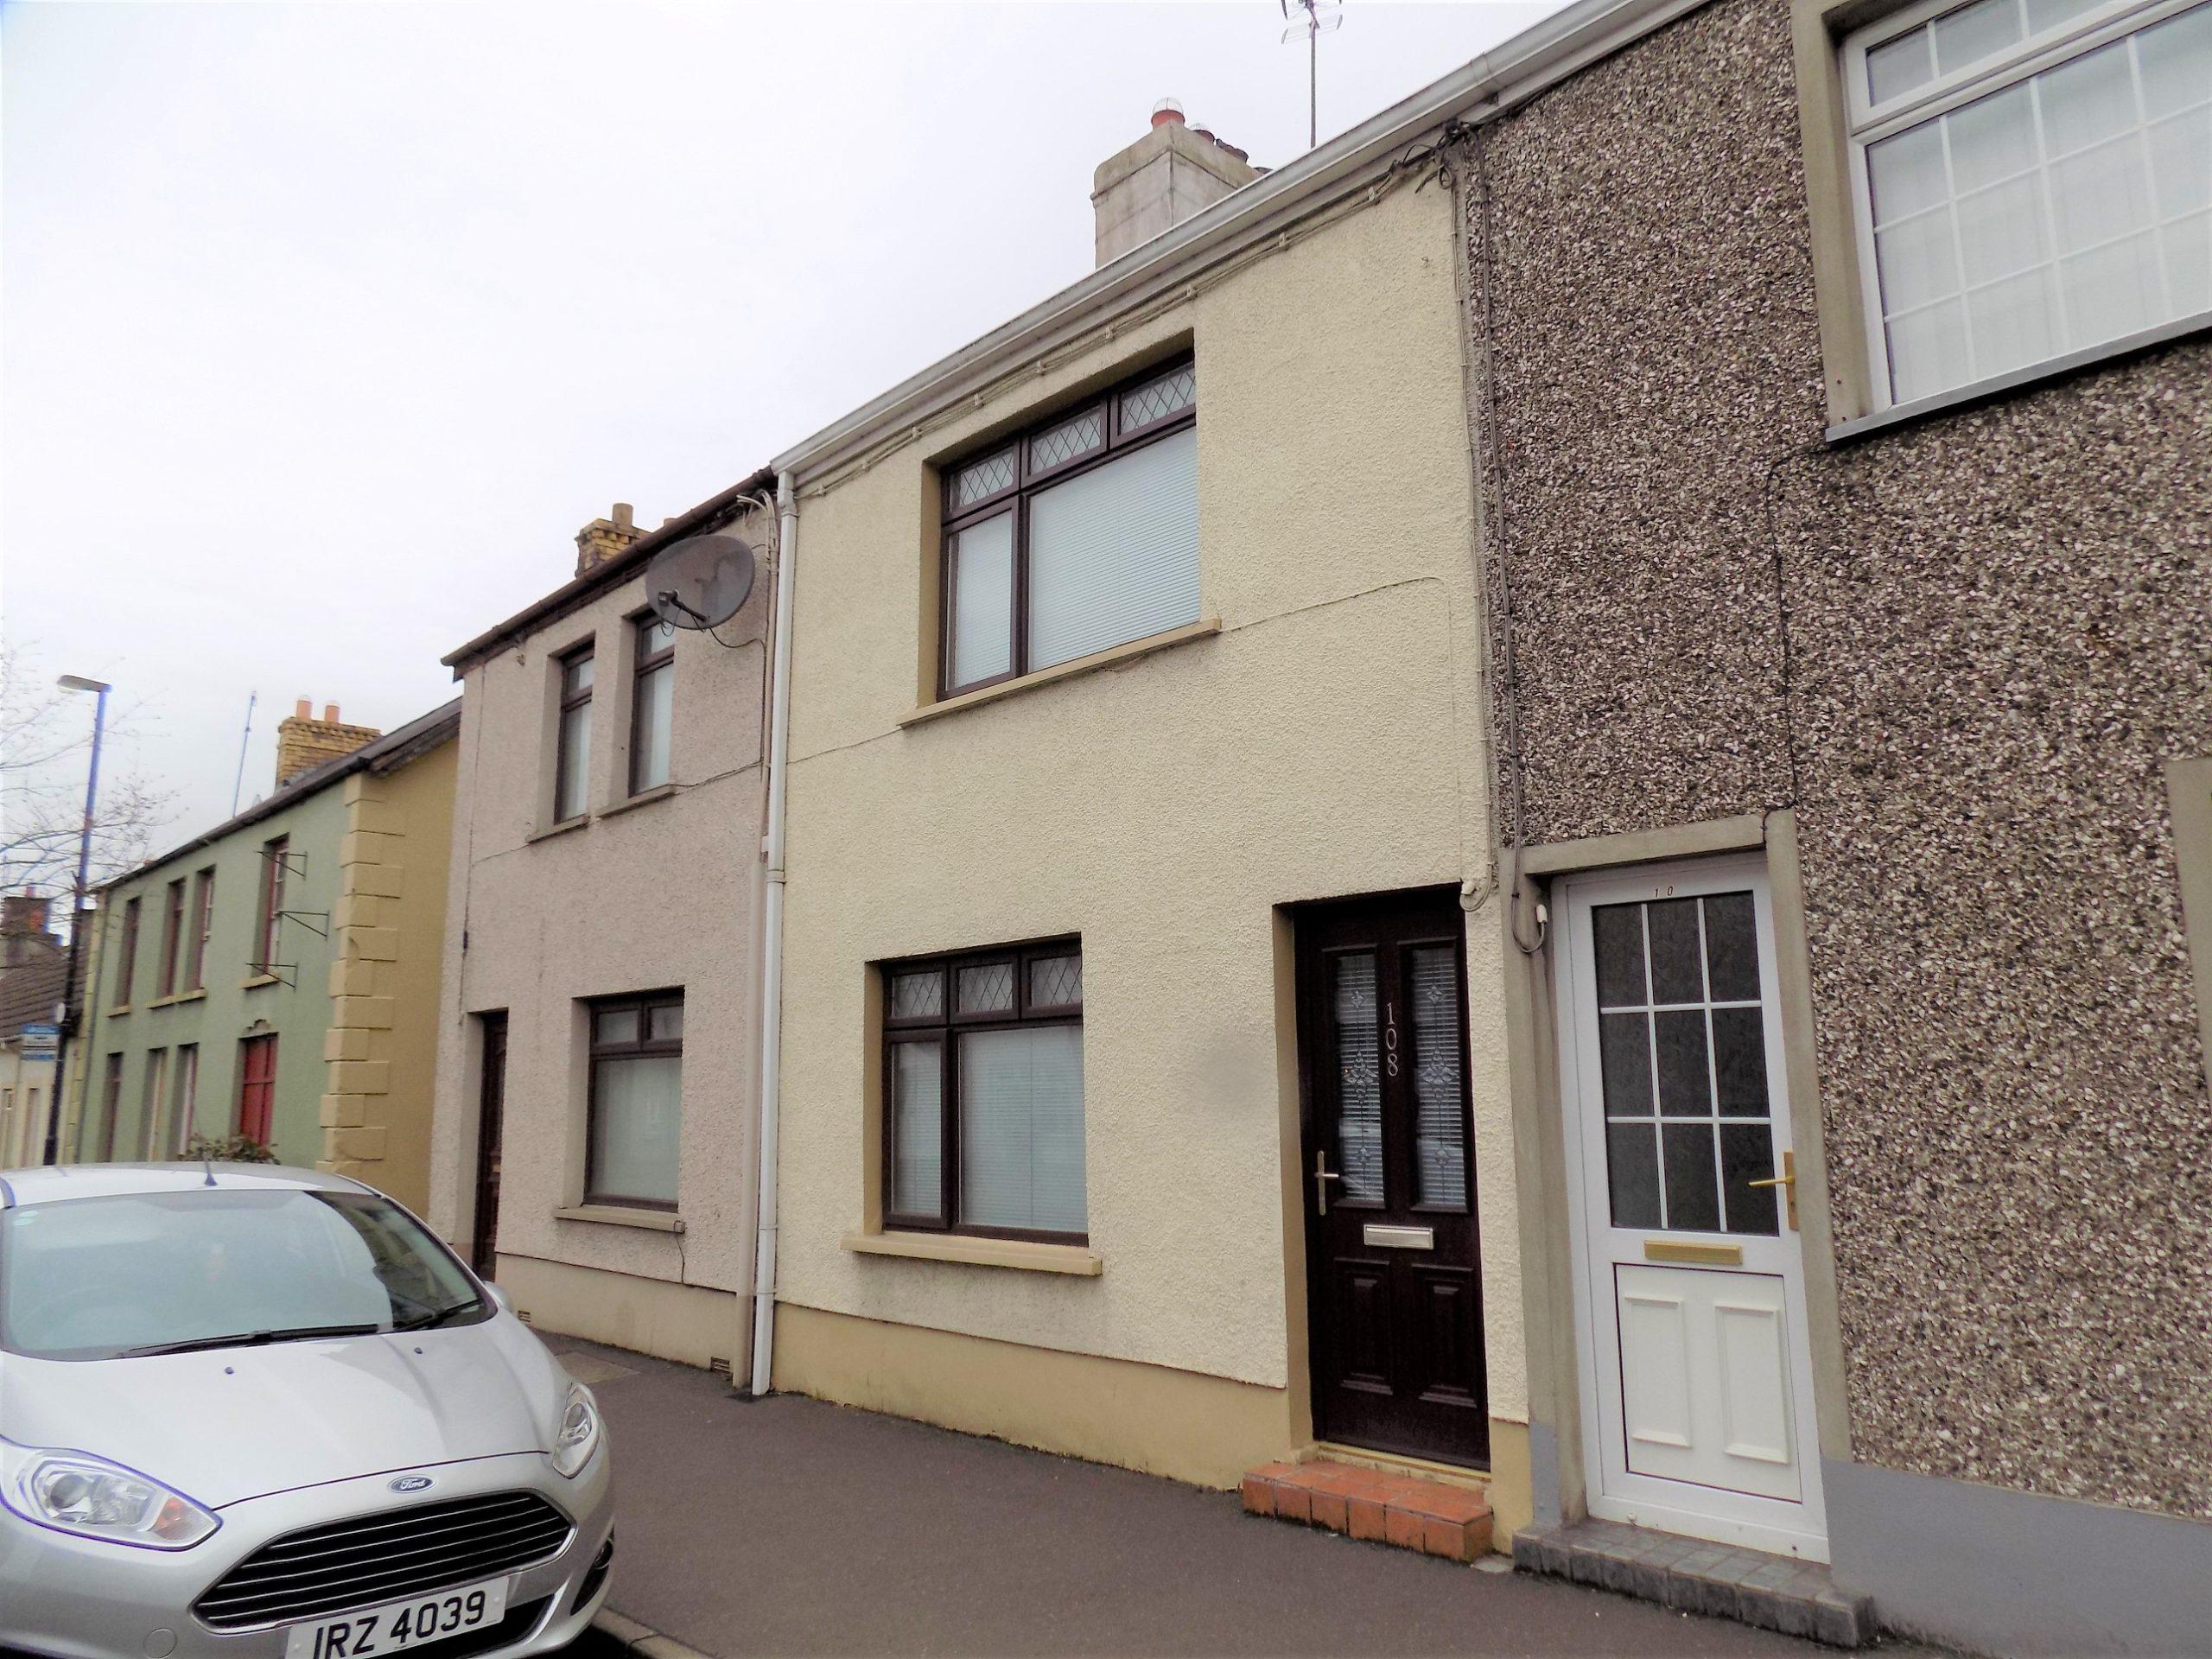 Image of 108 Main Street, Broughshane, Ballymena, Co Antrim, BT42 4JA